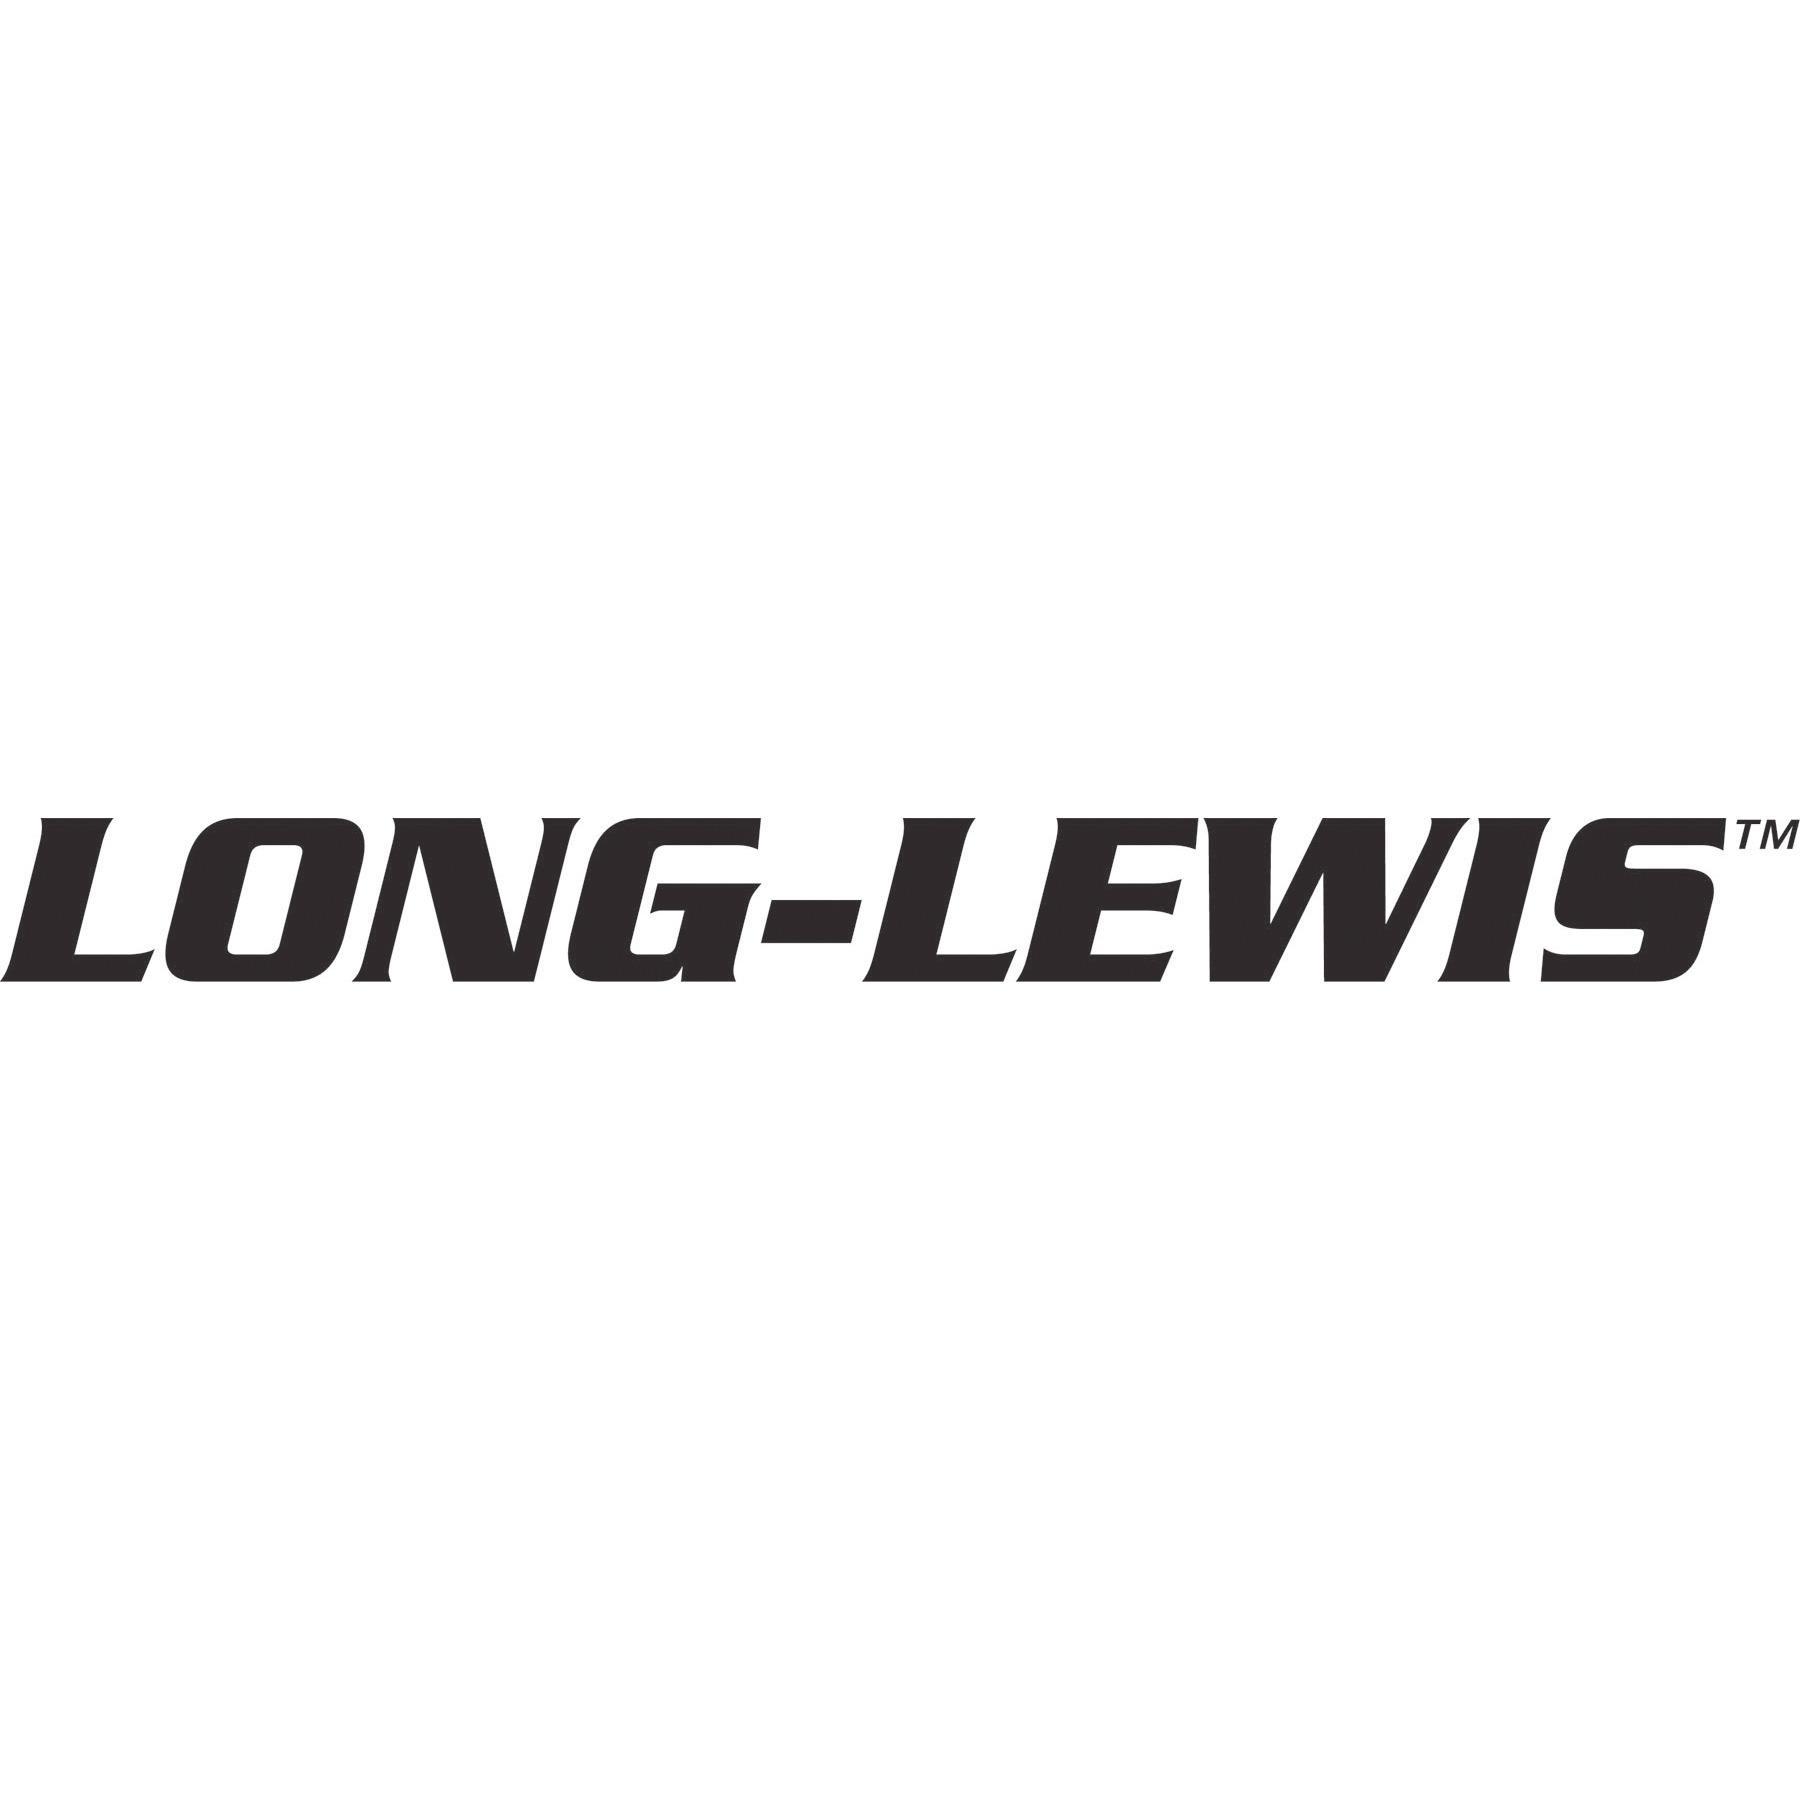 Long-Lewis Mitsubishi, Montgomery Alabama (AL